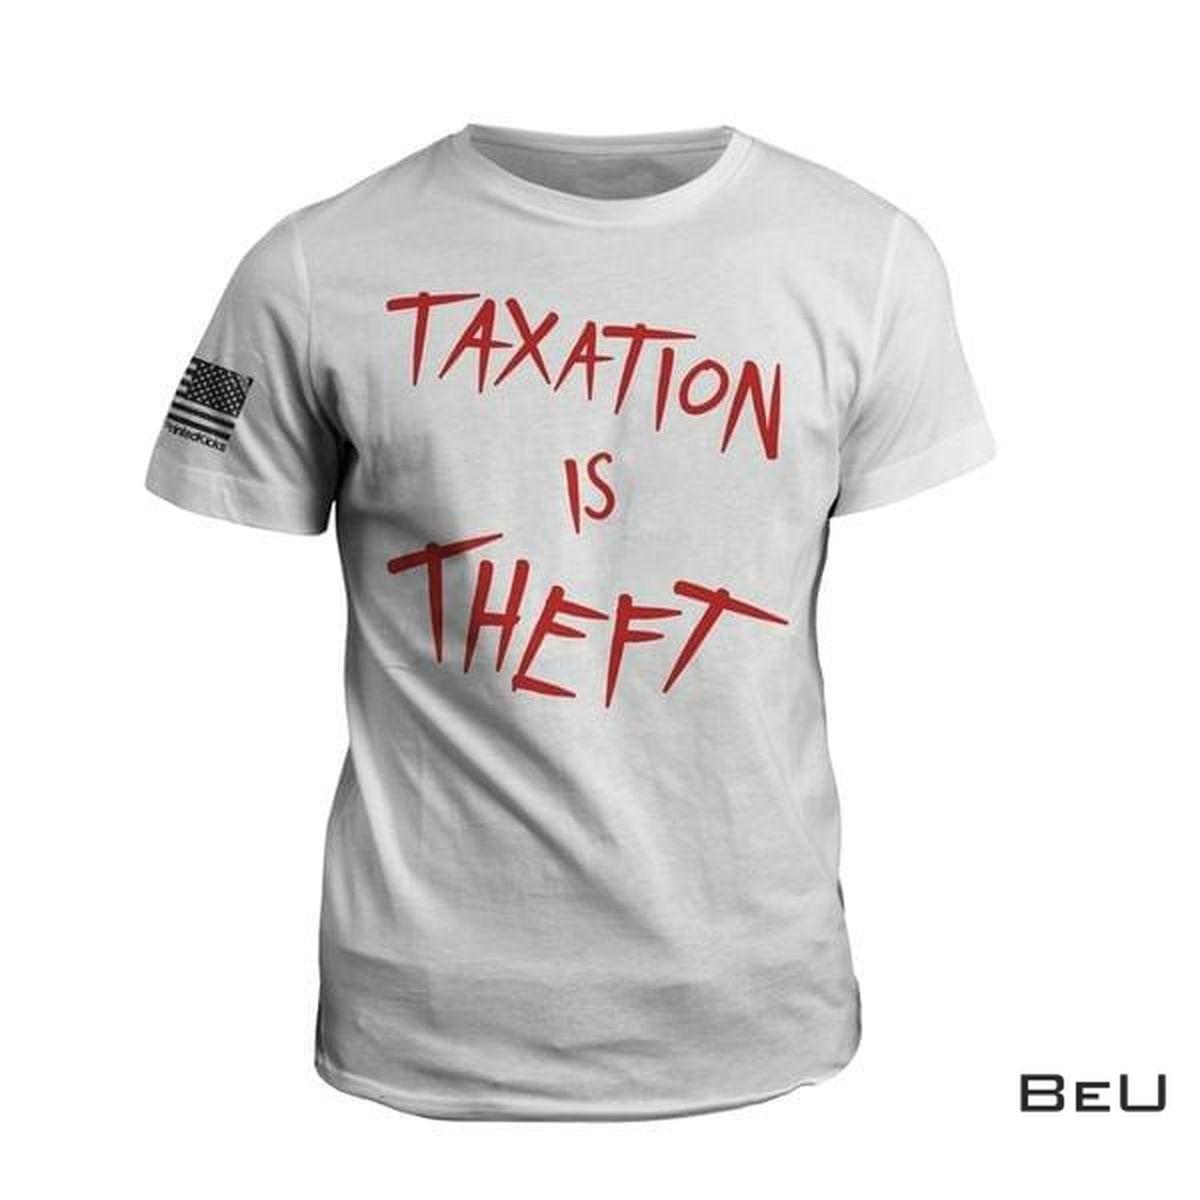 Top Taxation Is Theft Shirt